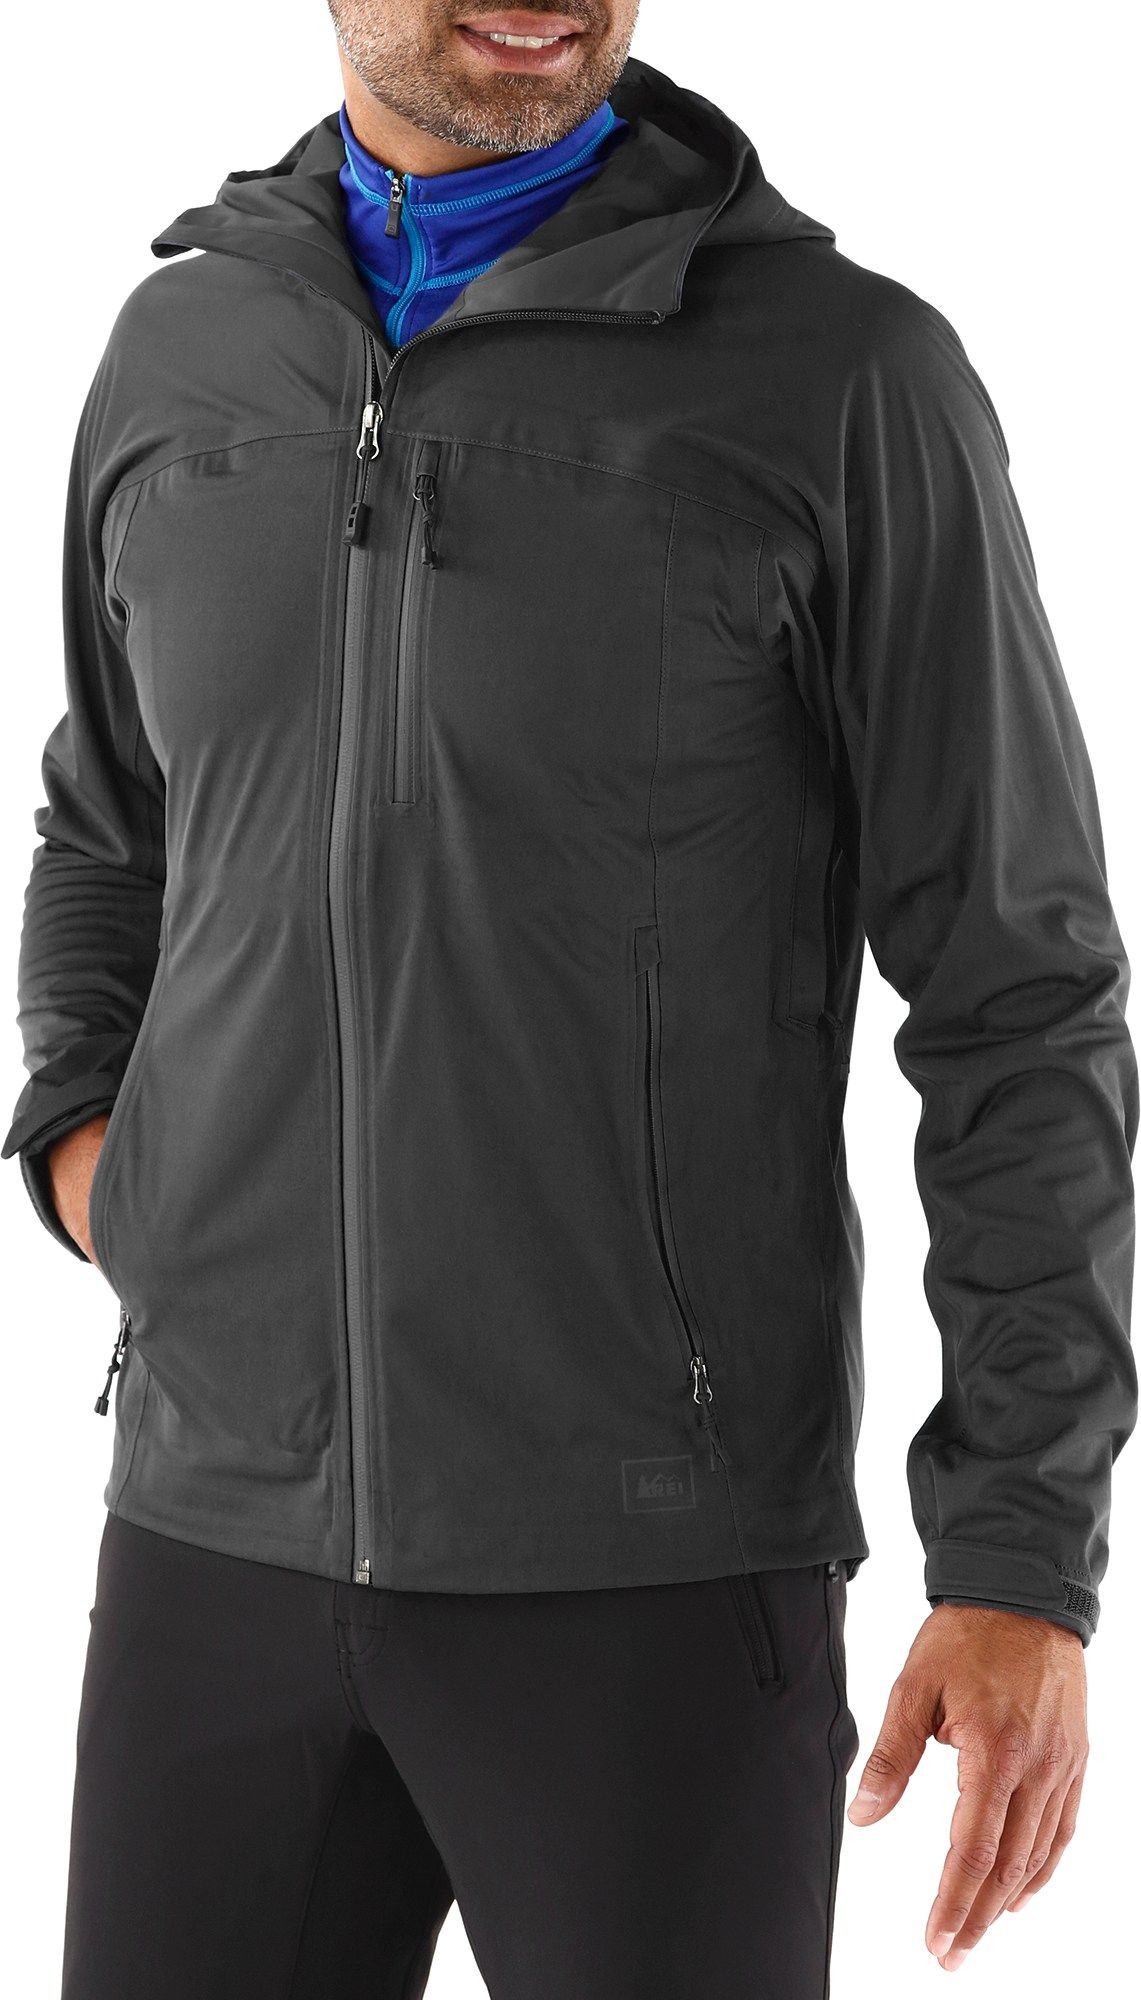 REI Motility Rain Jacket - Men's - Special Buy | Globetrotting ...